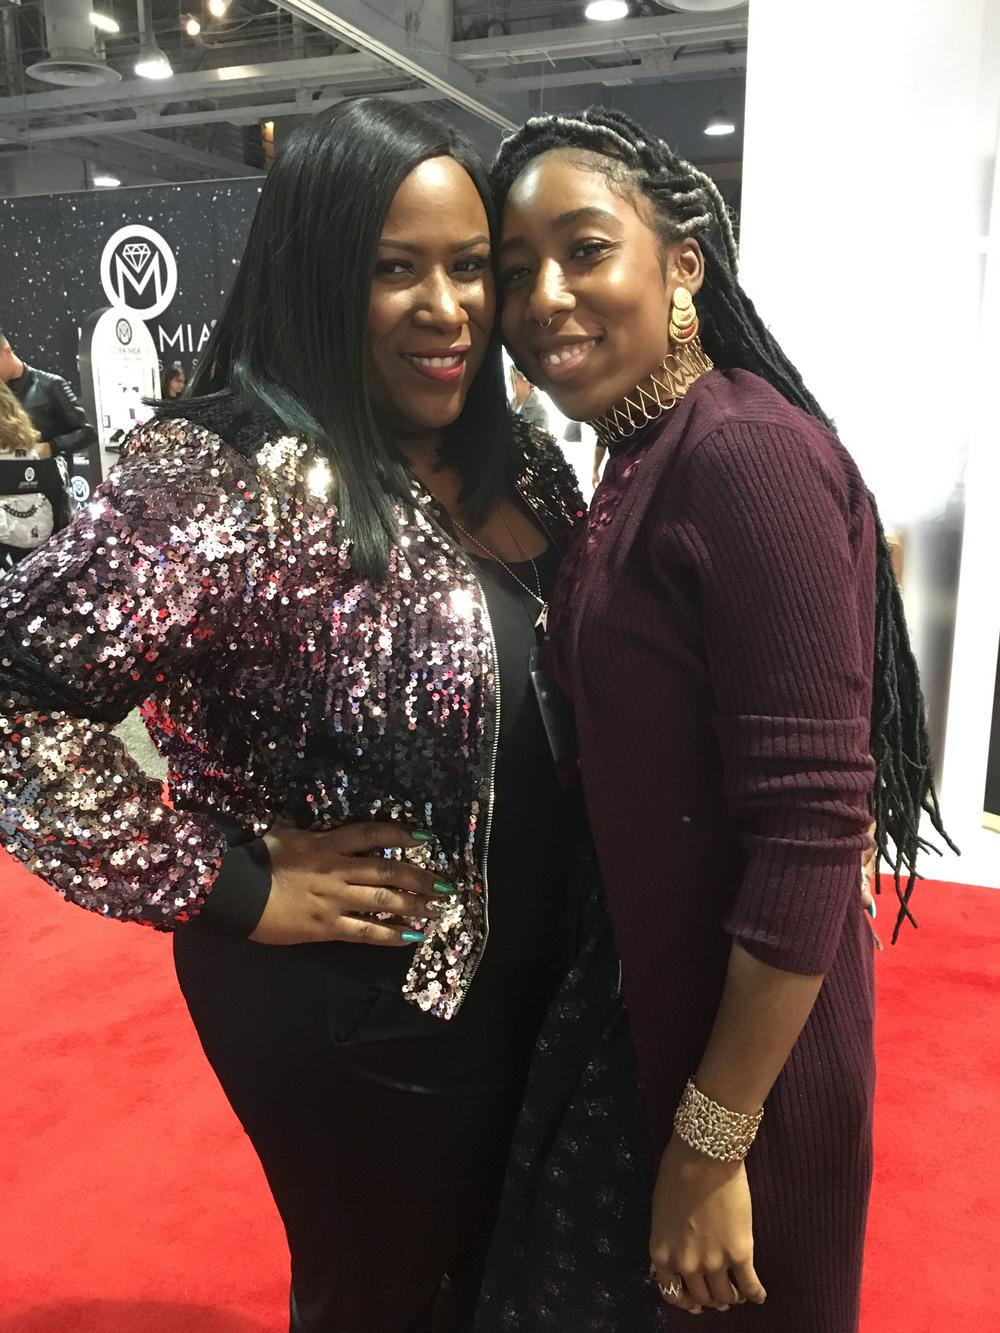 <p>Tameka Jackson and Lavette Cephus</p>